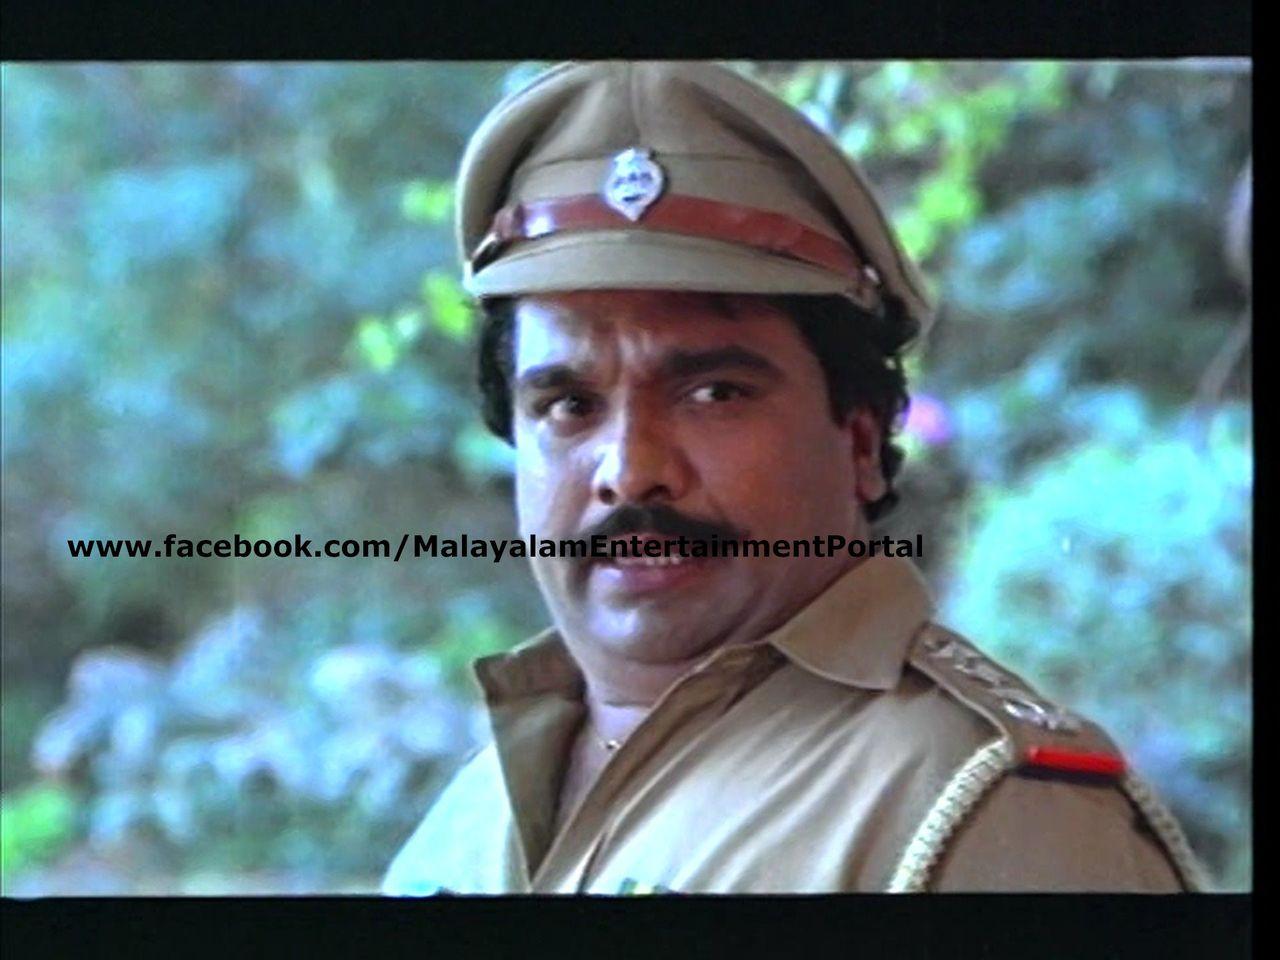 Mukundetta Sumithra Vilikyunnu Saina DVD Screenshots Bscap0015